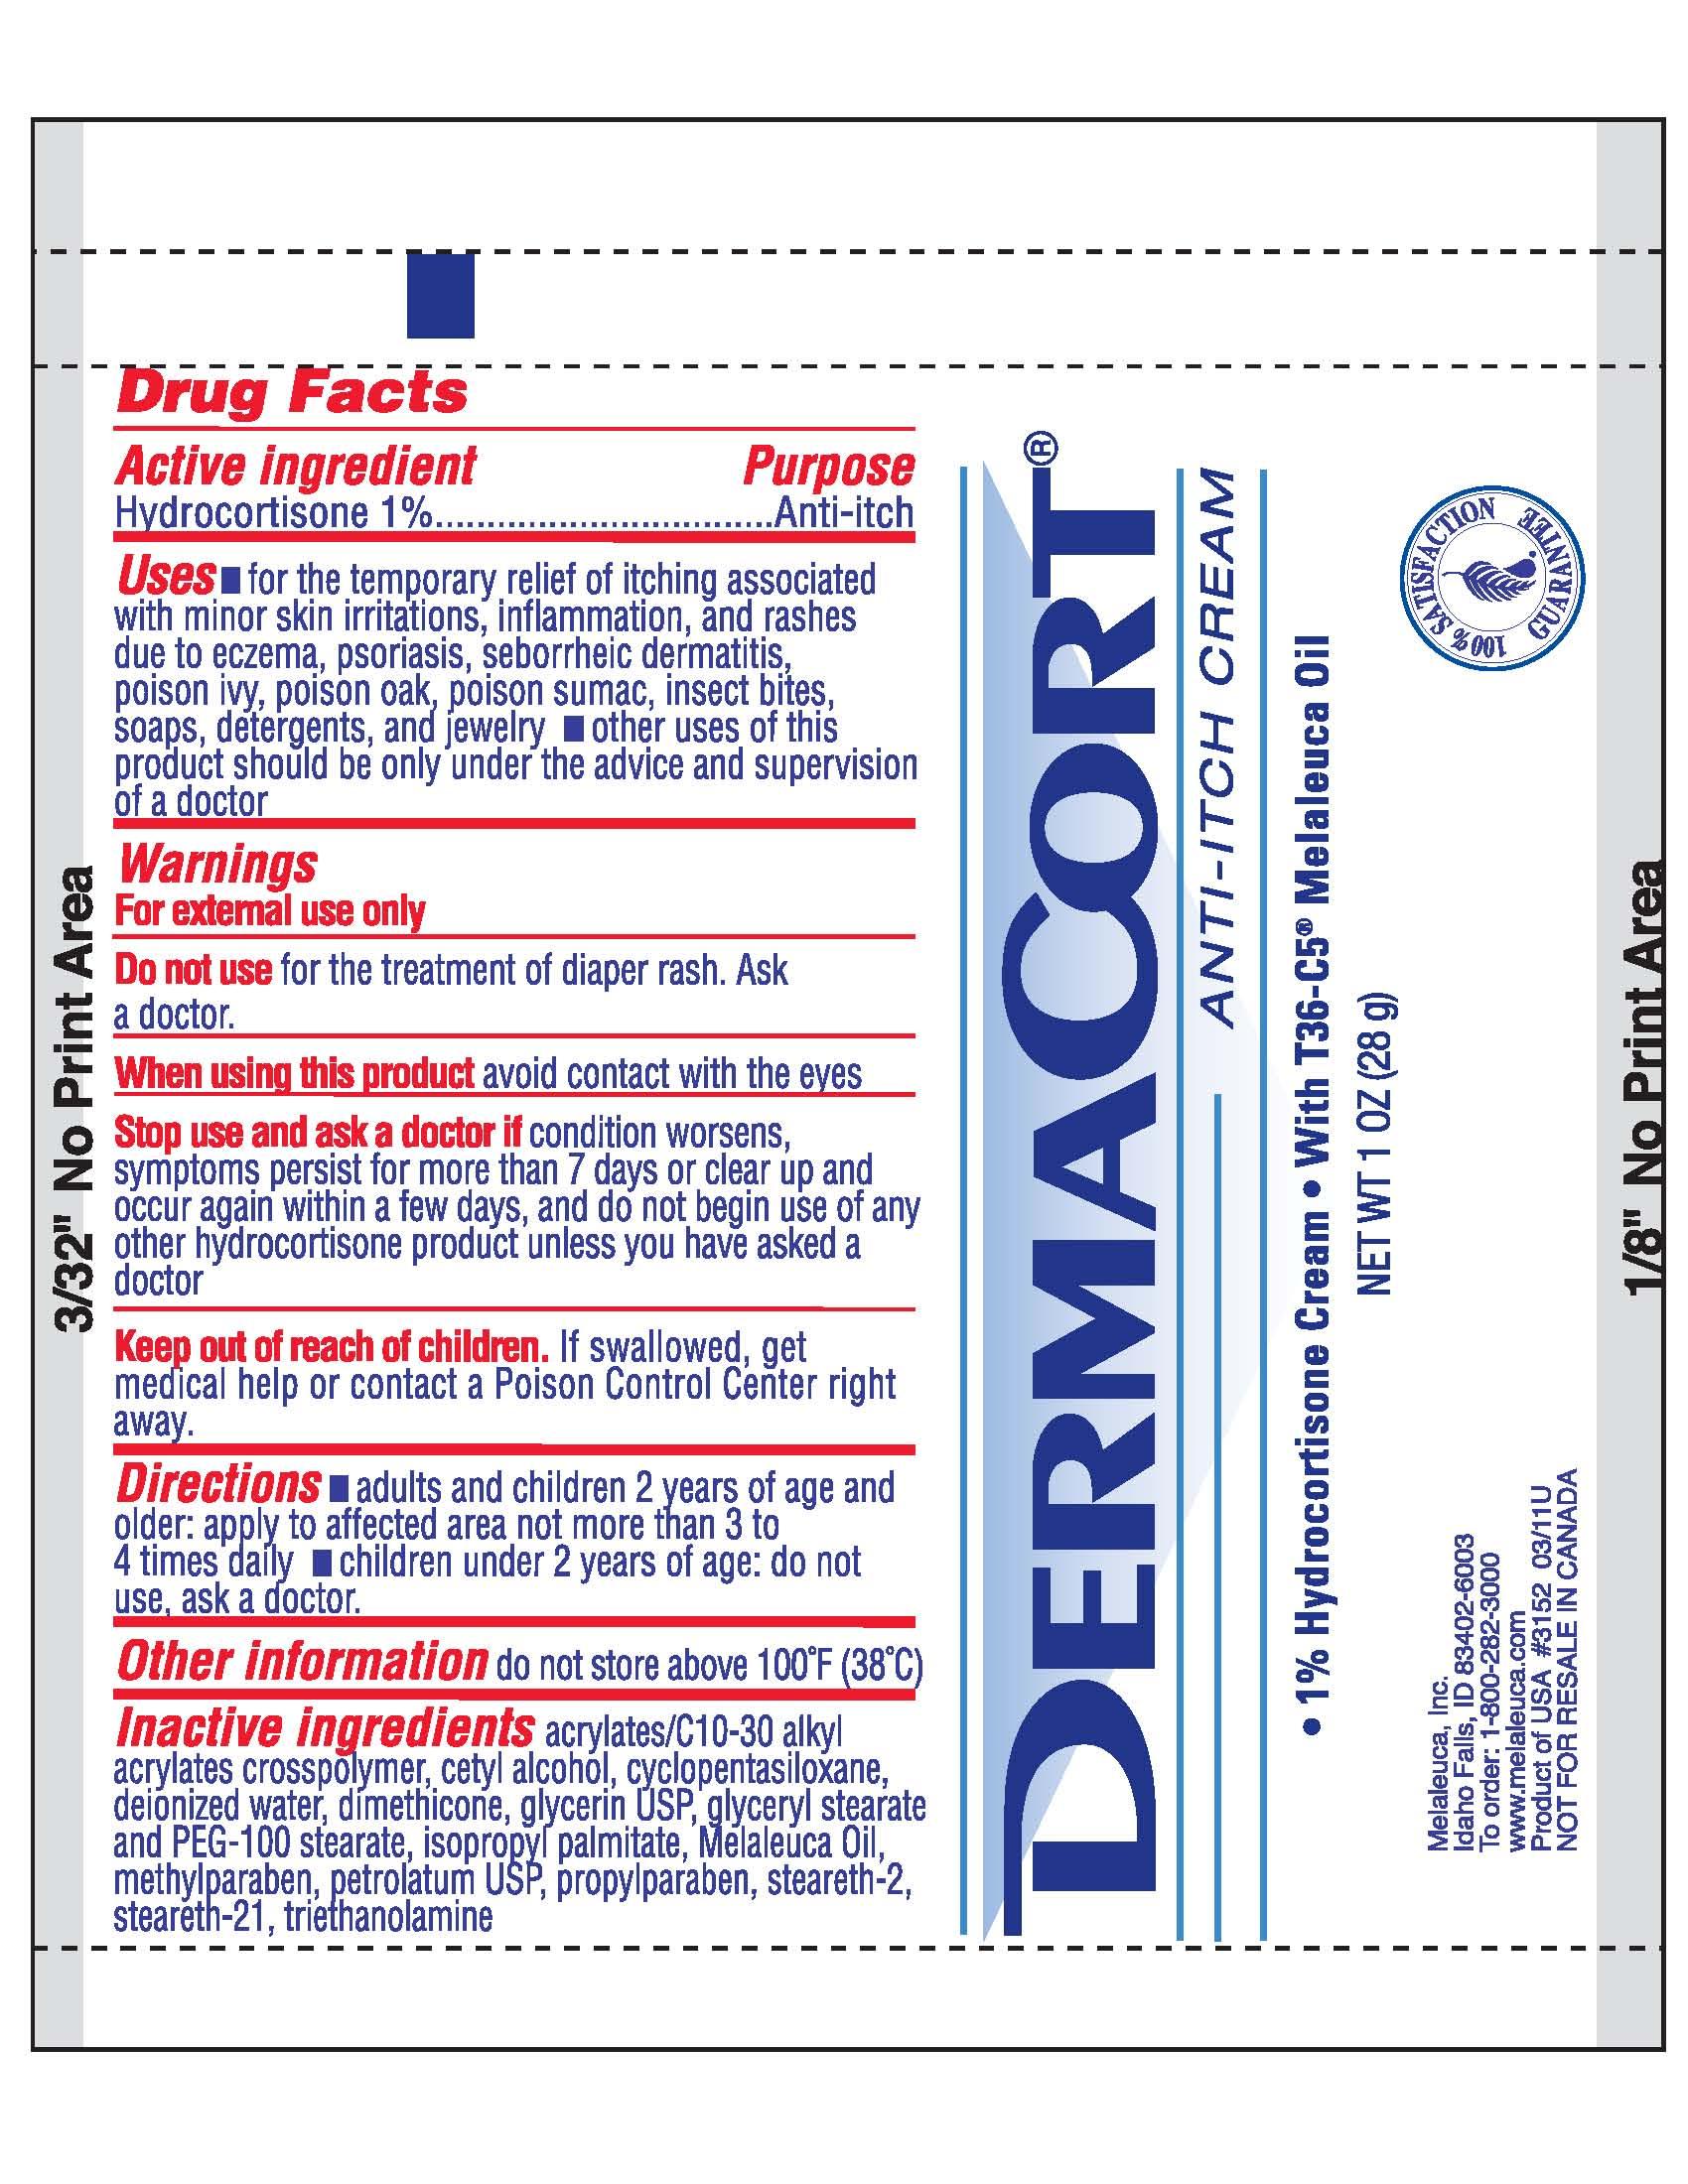 Dermacort Anti-itch (Hydrocortisone) Cream [Melaleuca, Inc.]